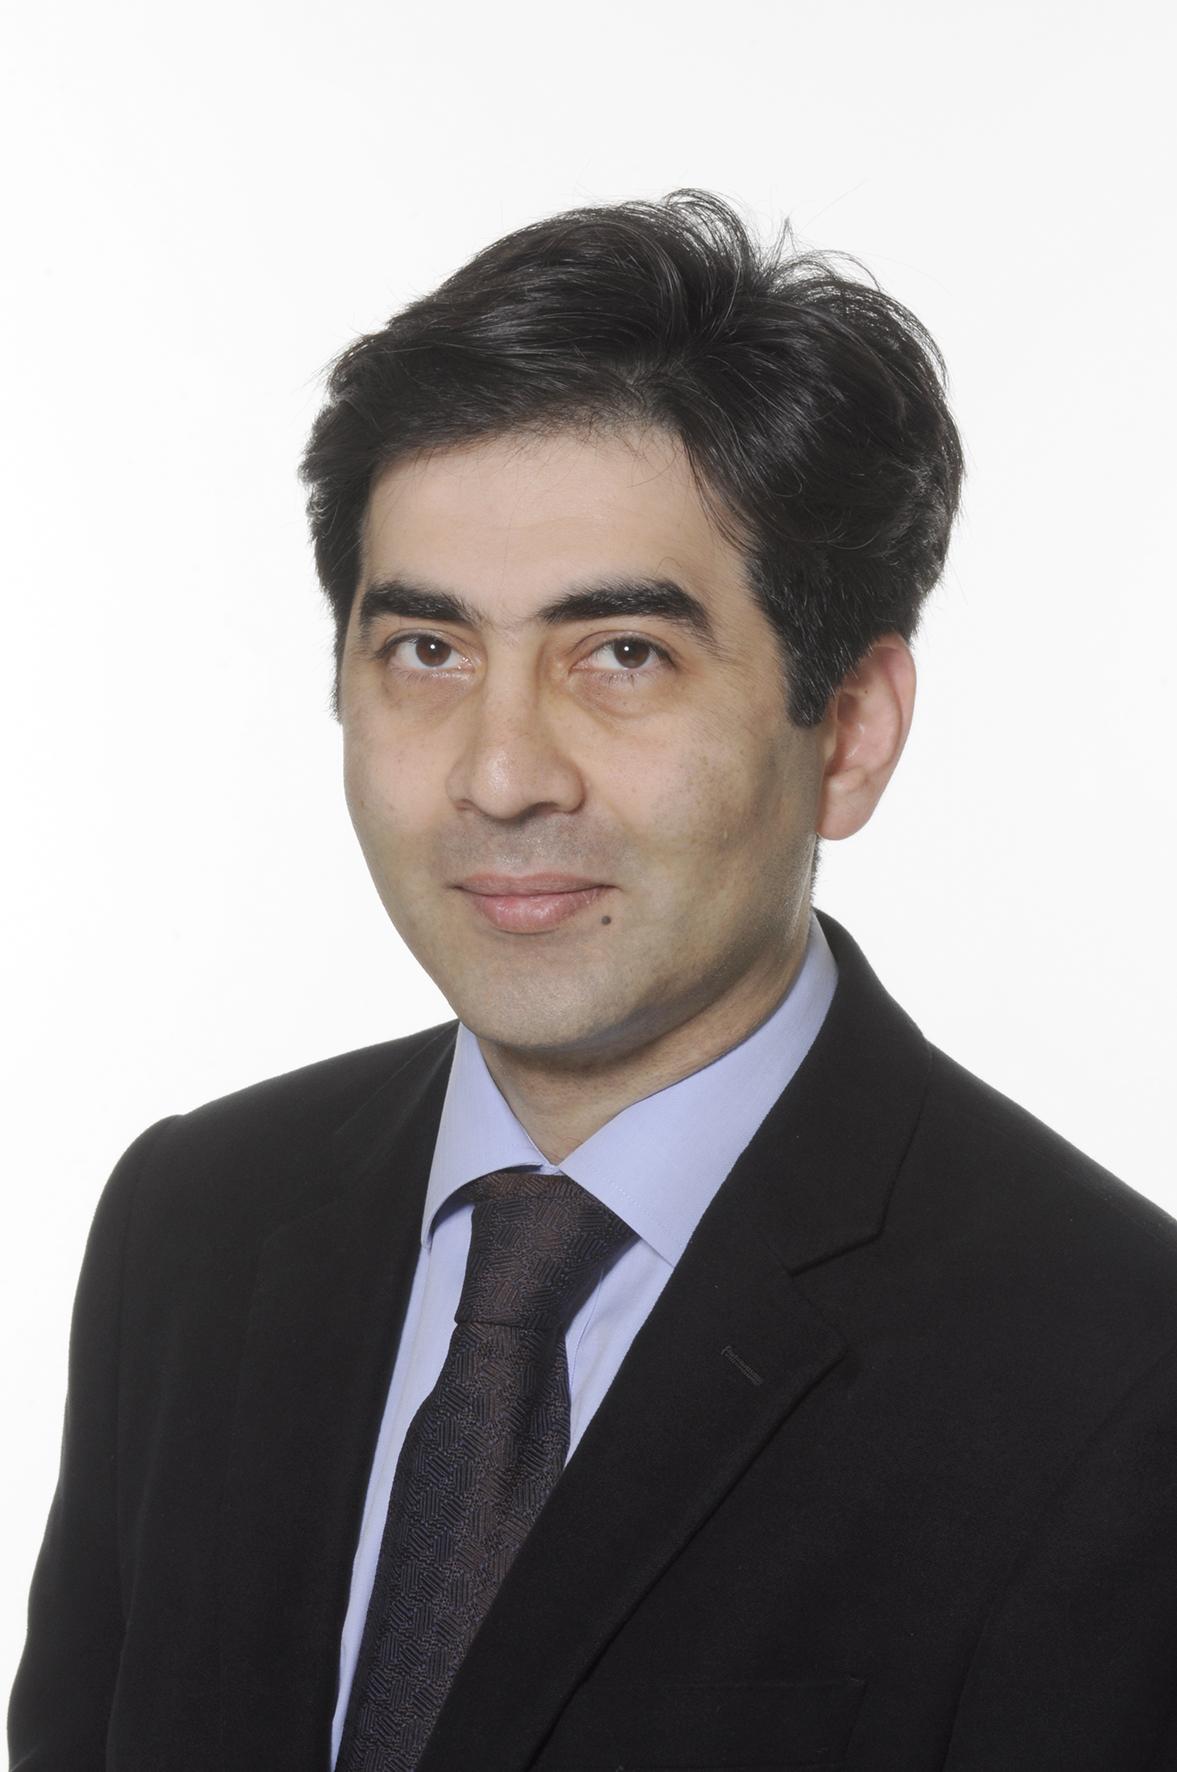 Nik Sabharwal